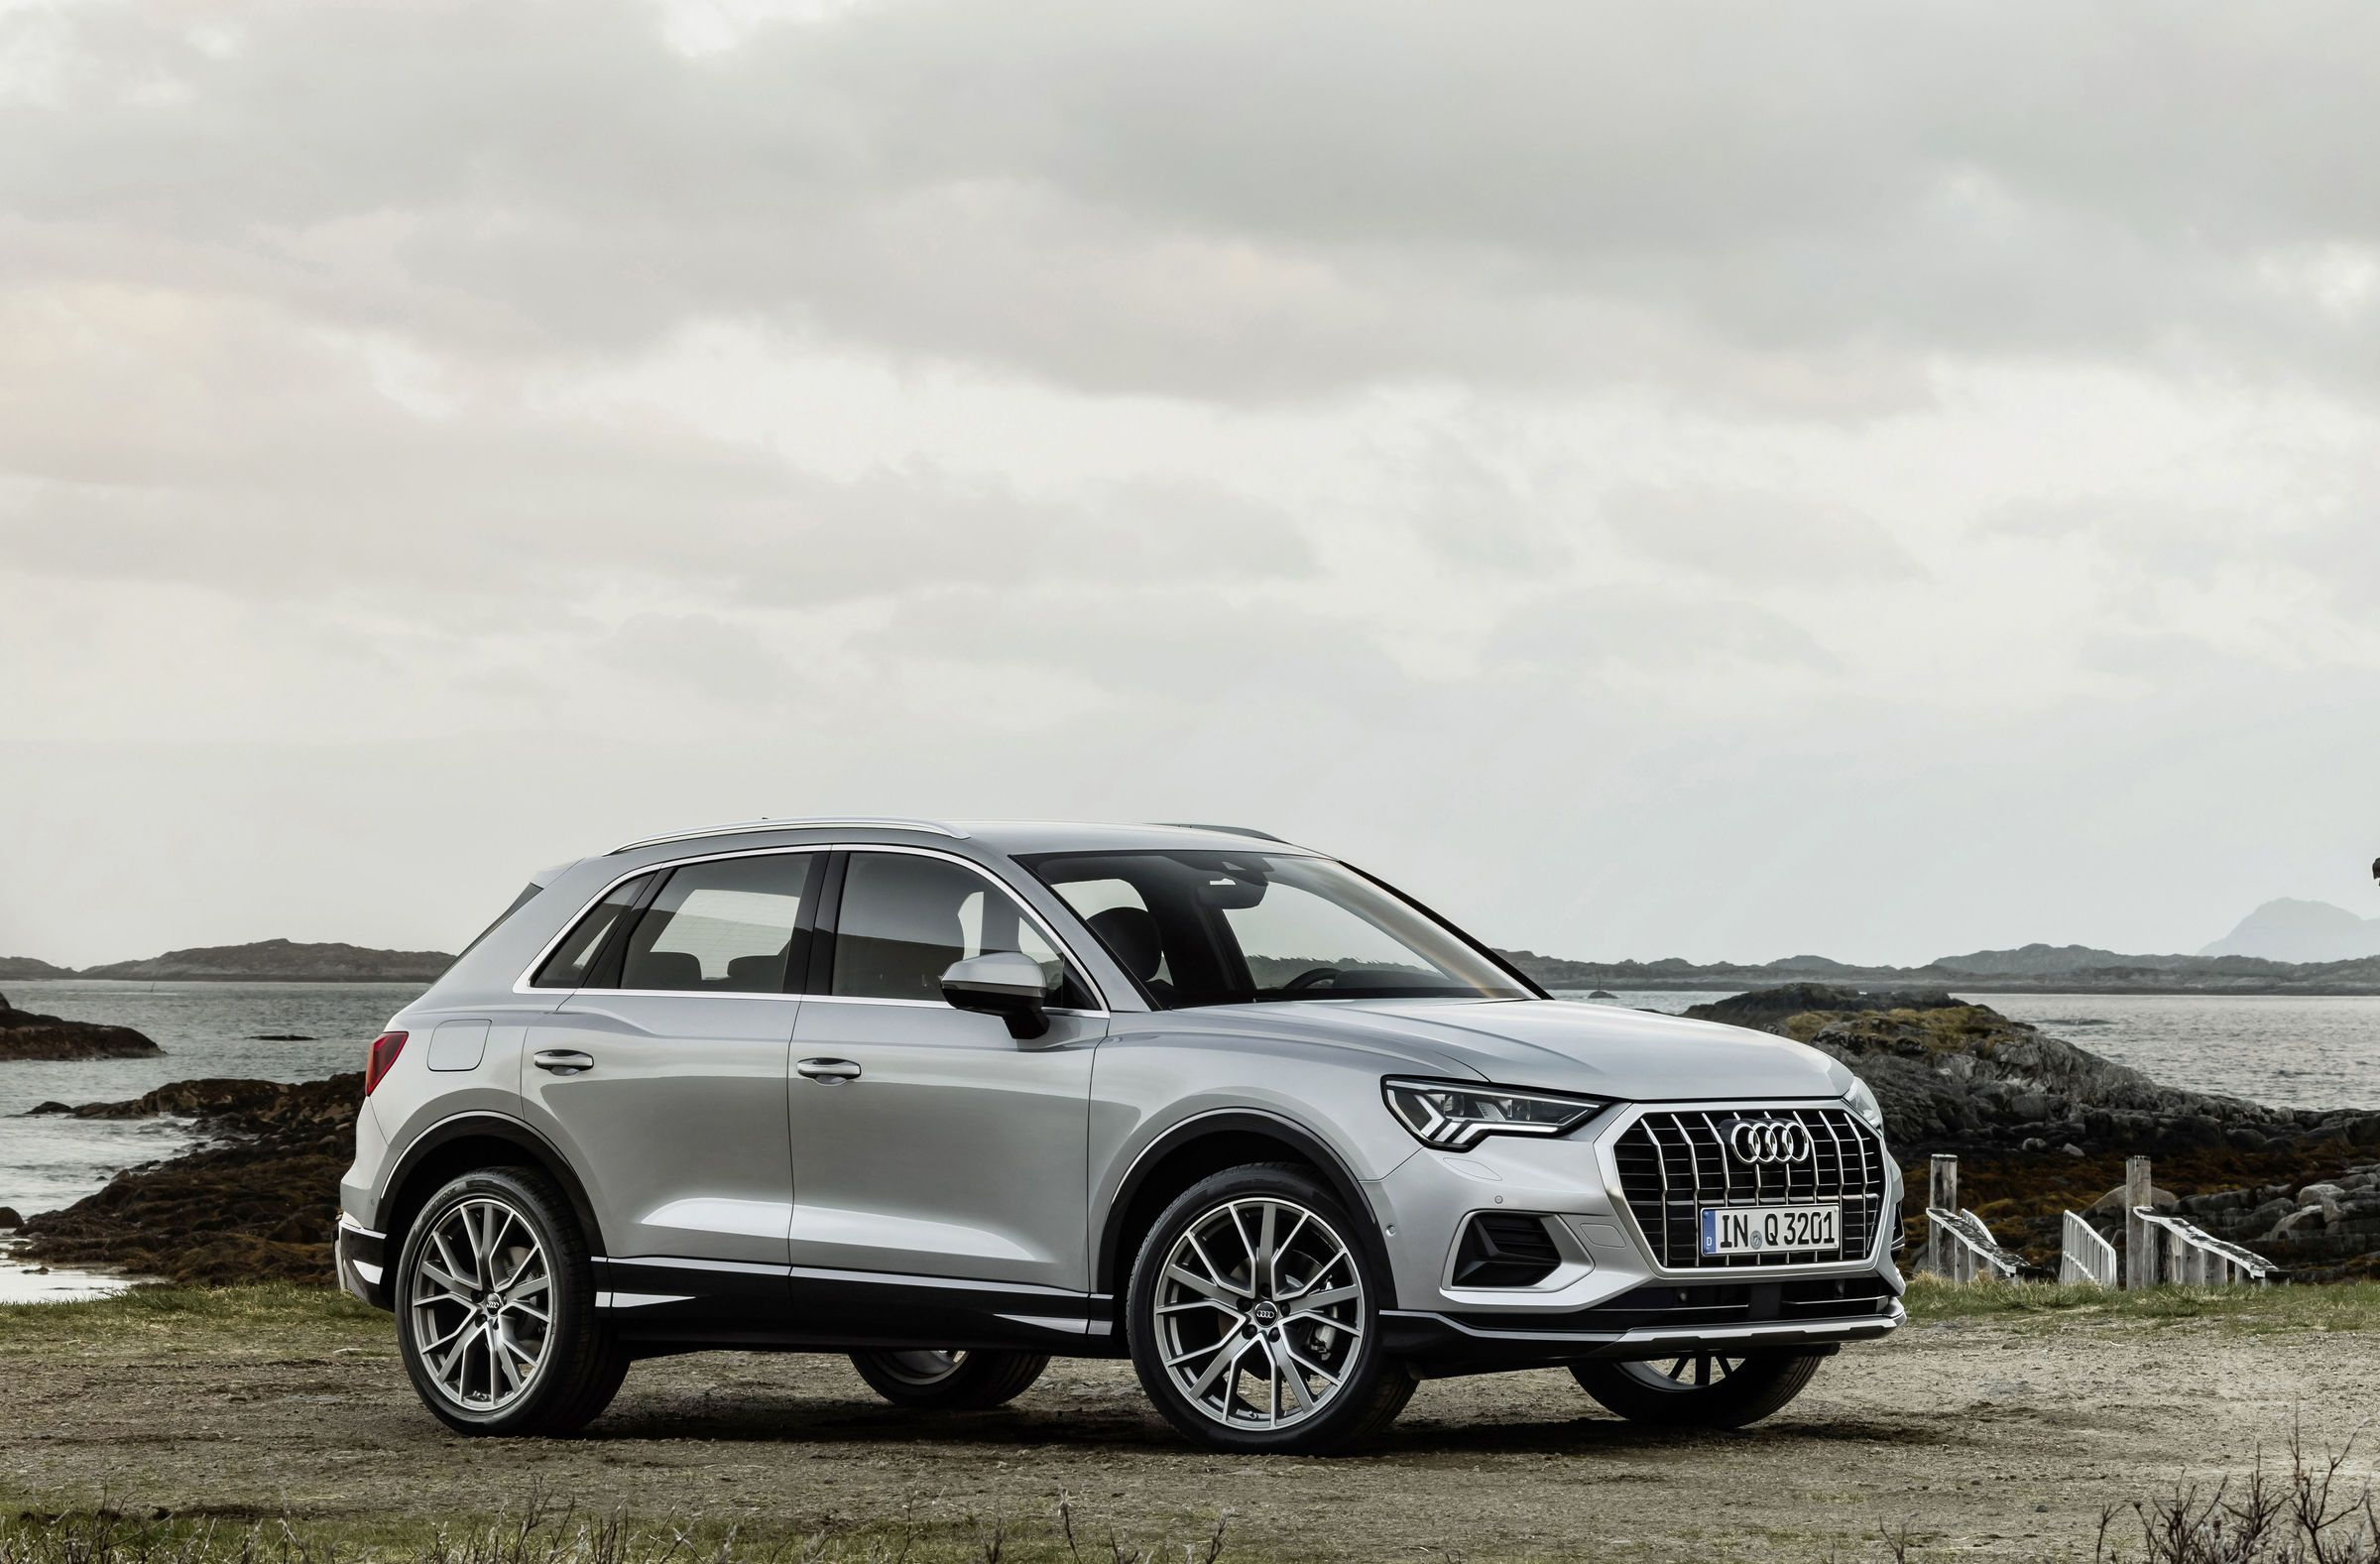 The Second Generation 2019 Audi Q3 Revealed Luxury Motor Press Audi Q3 Luxury Motor Audi